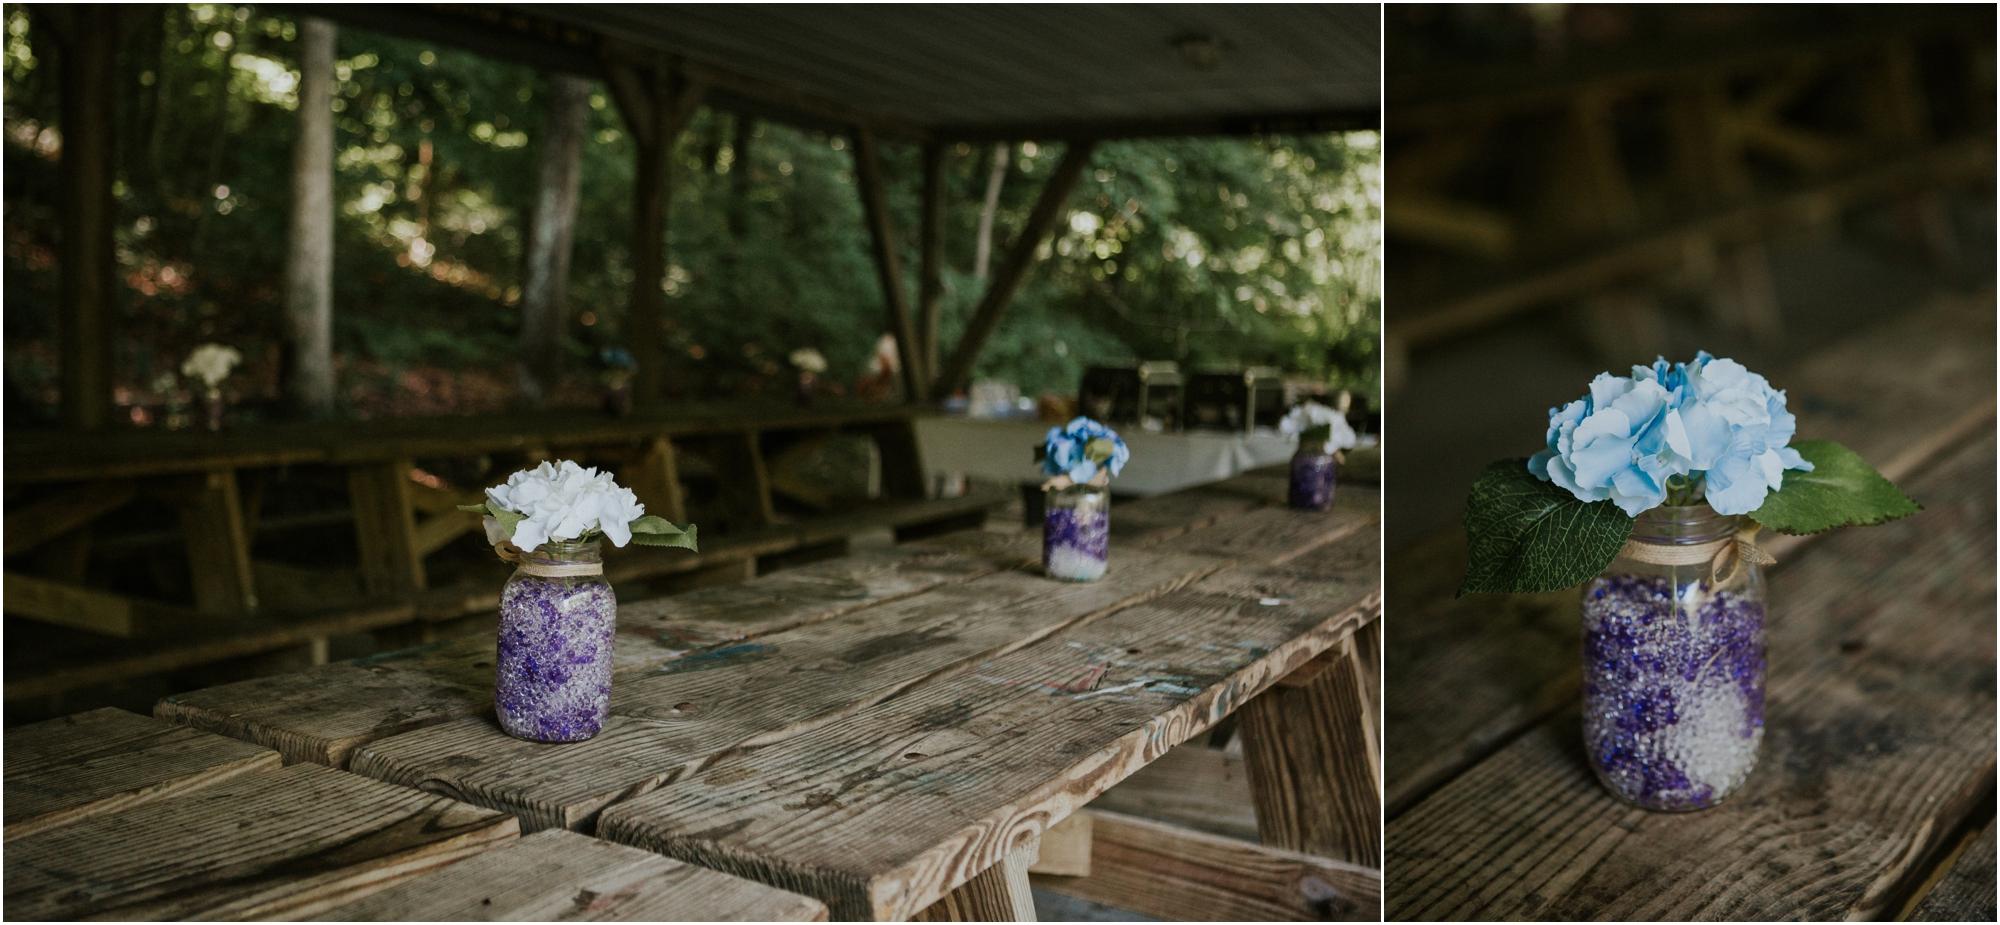 sugar-hollow-park-bristol-virginia-wedding-intimate-woodsy-black-forest-ceremony-adventurous-couple_0100.jpg